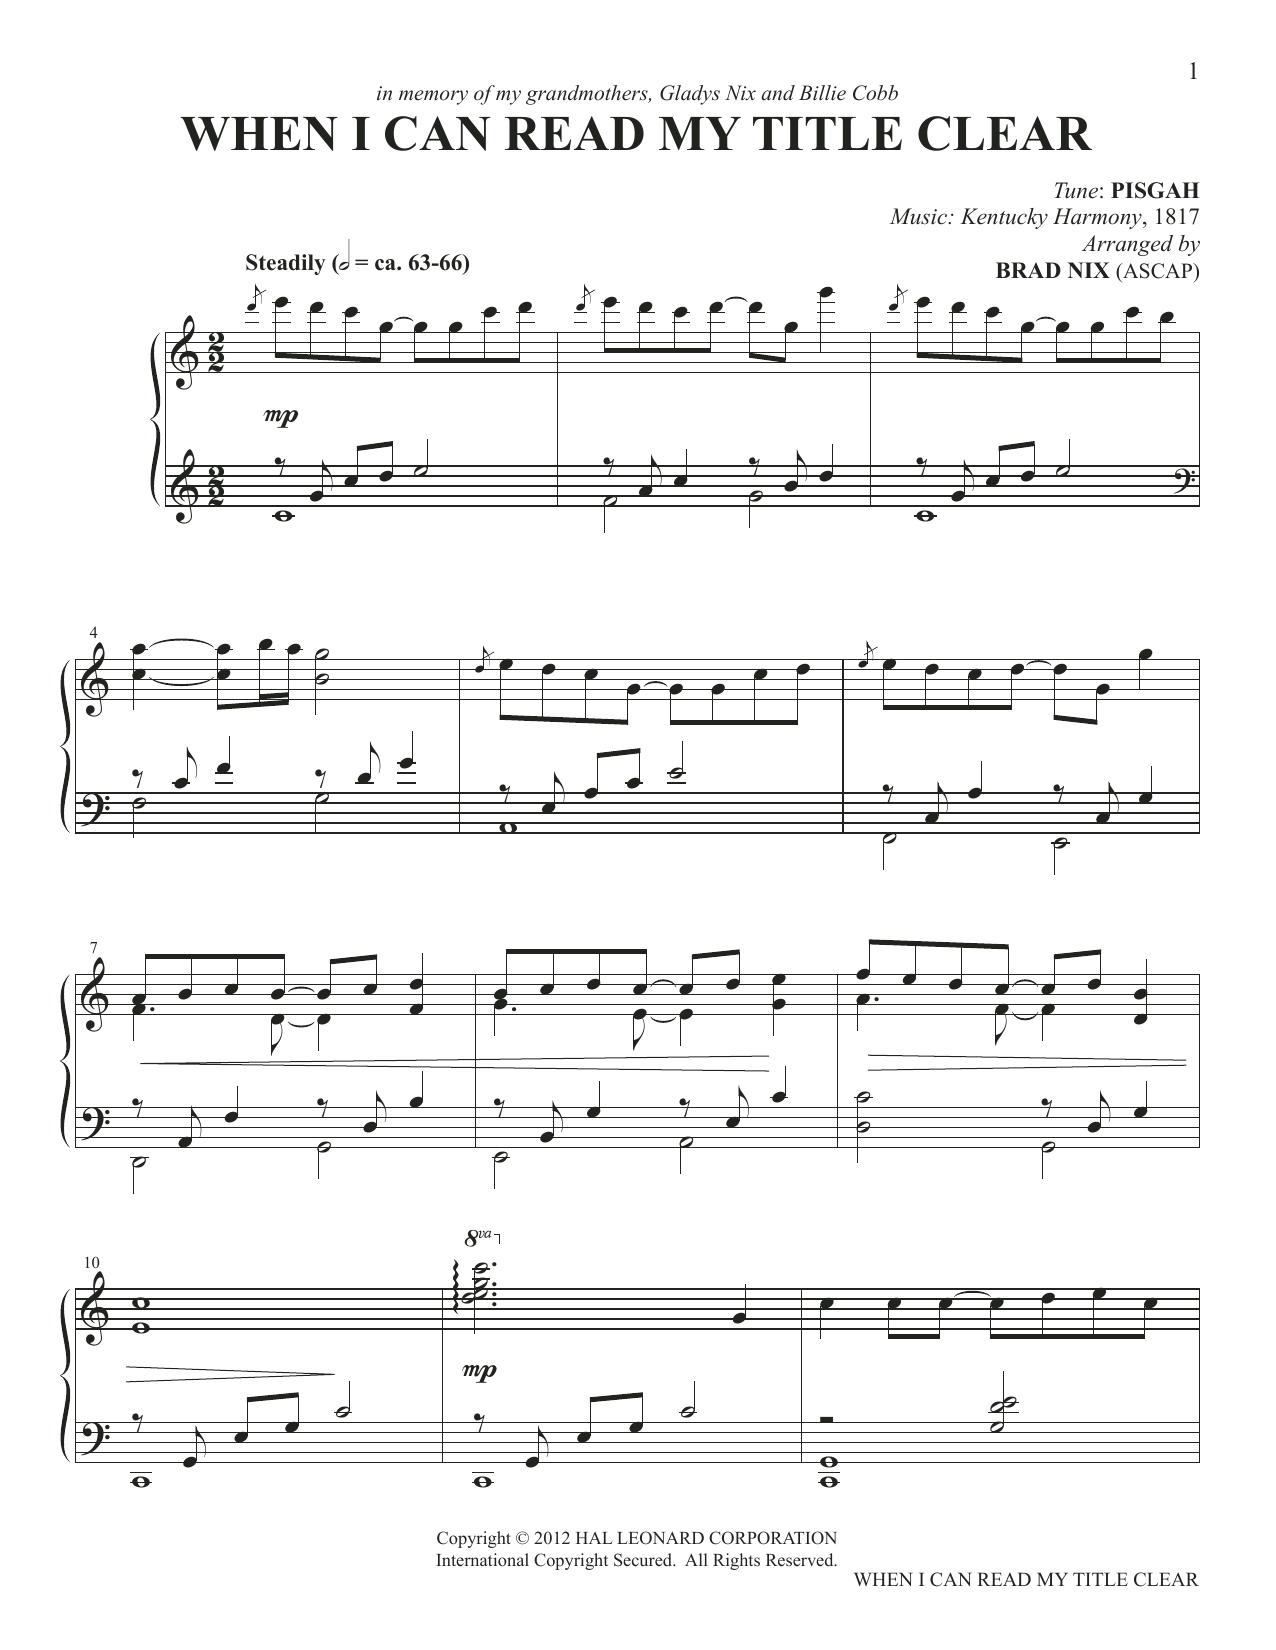 When I Can Read My Title Clear (arr. Brad Nix) (Piano Solo)